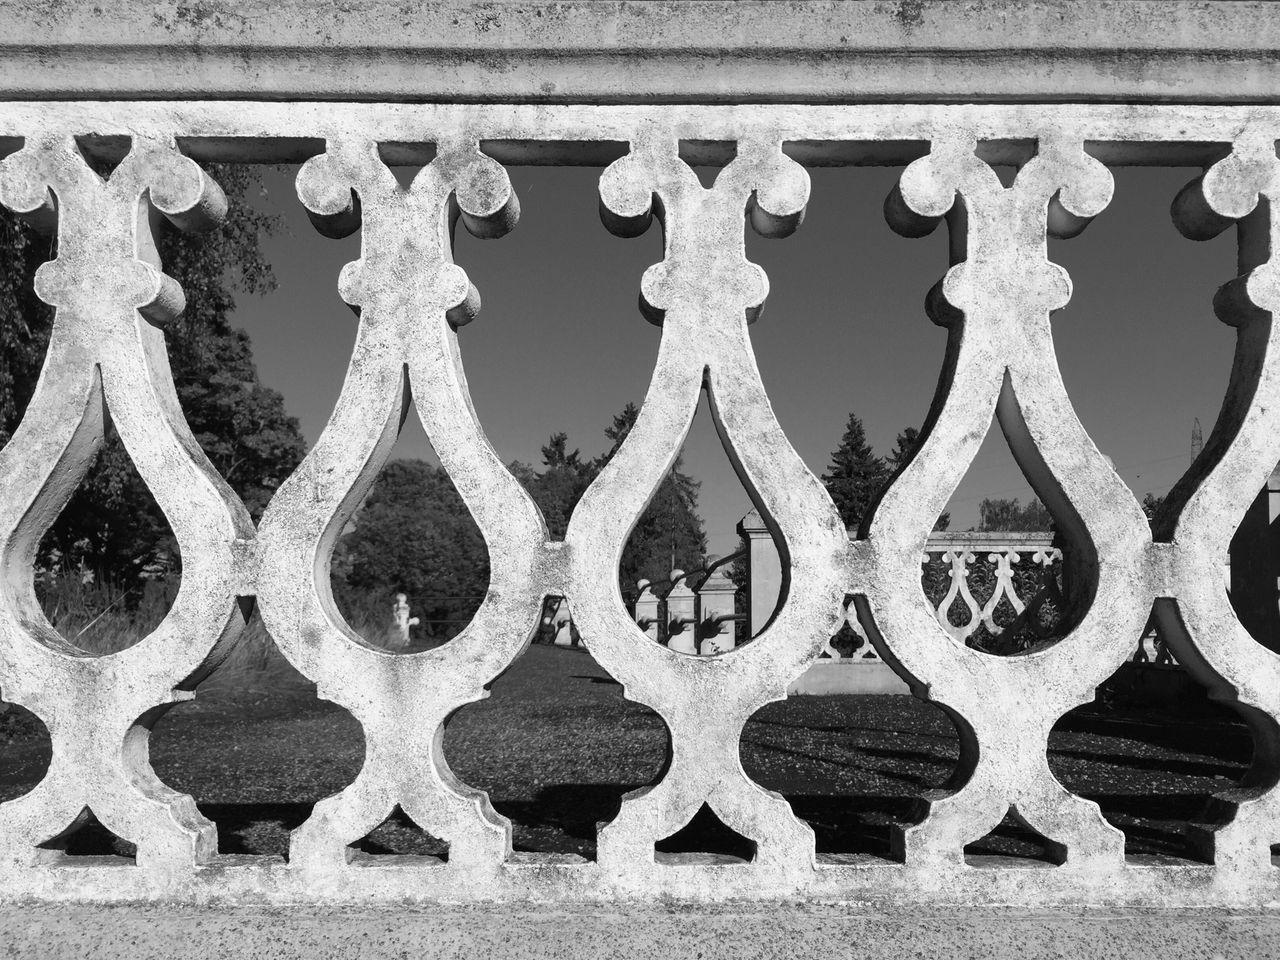 Architecture Window Minimalism_bw EyeEm Team Streetphoto_bw EyeEm Bnw Bw_collection Minimalist Minimalism EyeEm Best Shots Shadows EyeEm EyeEm Black&white! Built Structure Architectural Feature